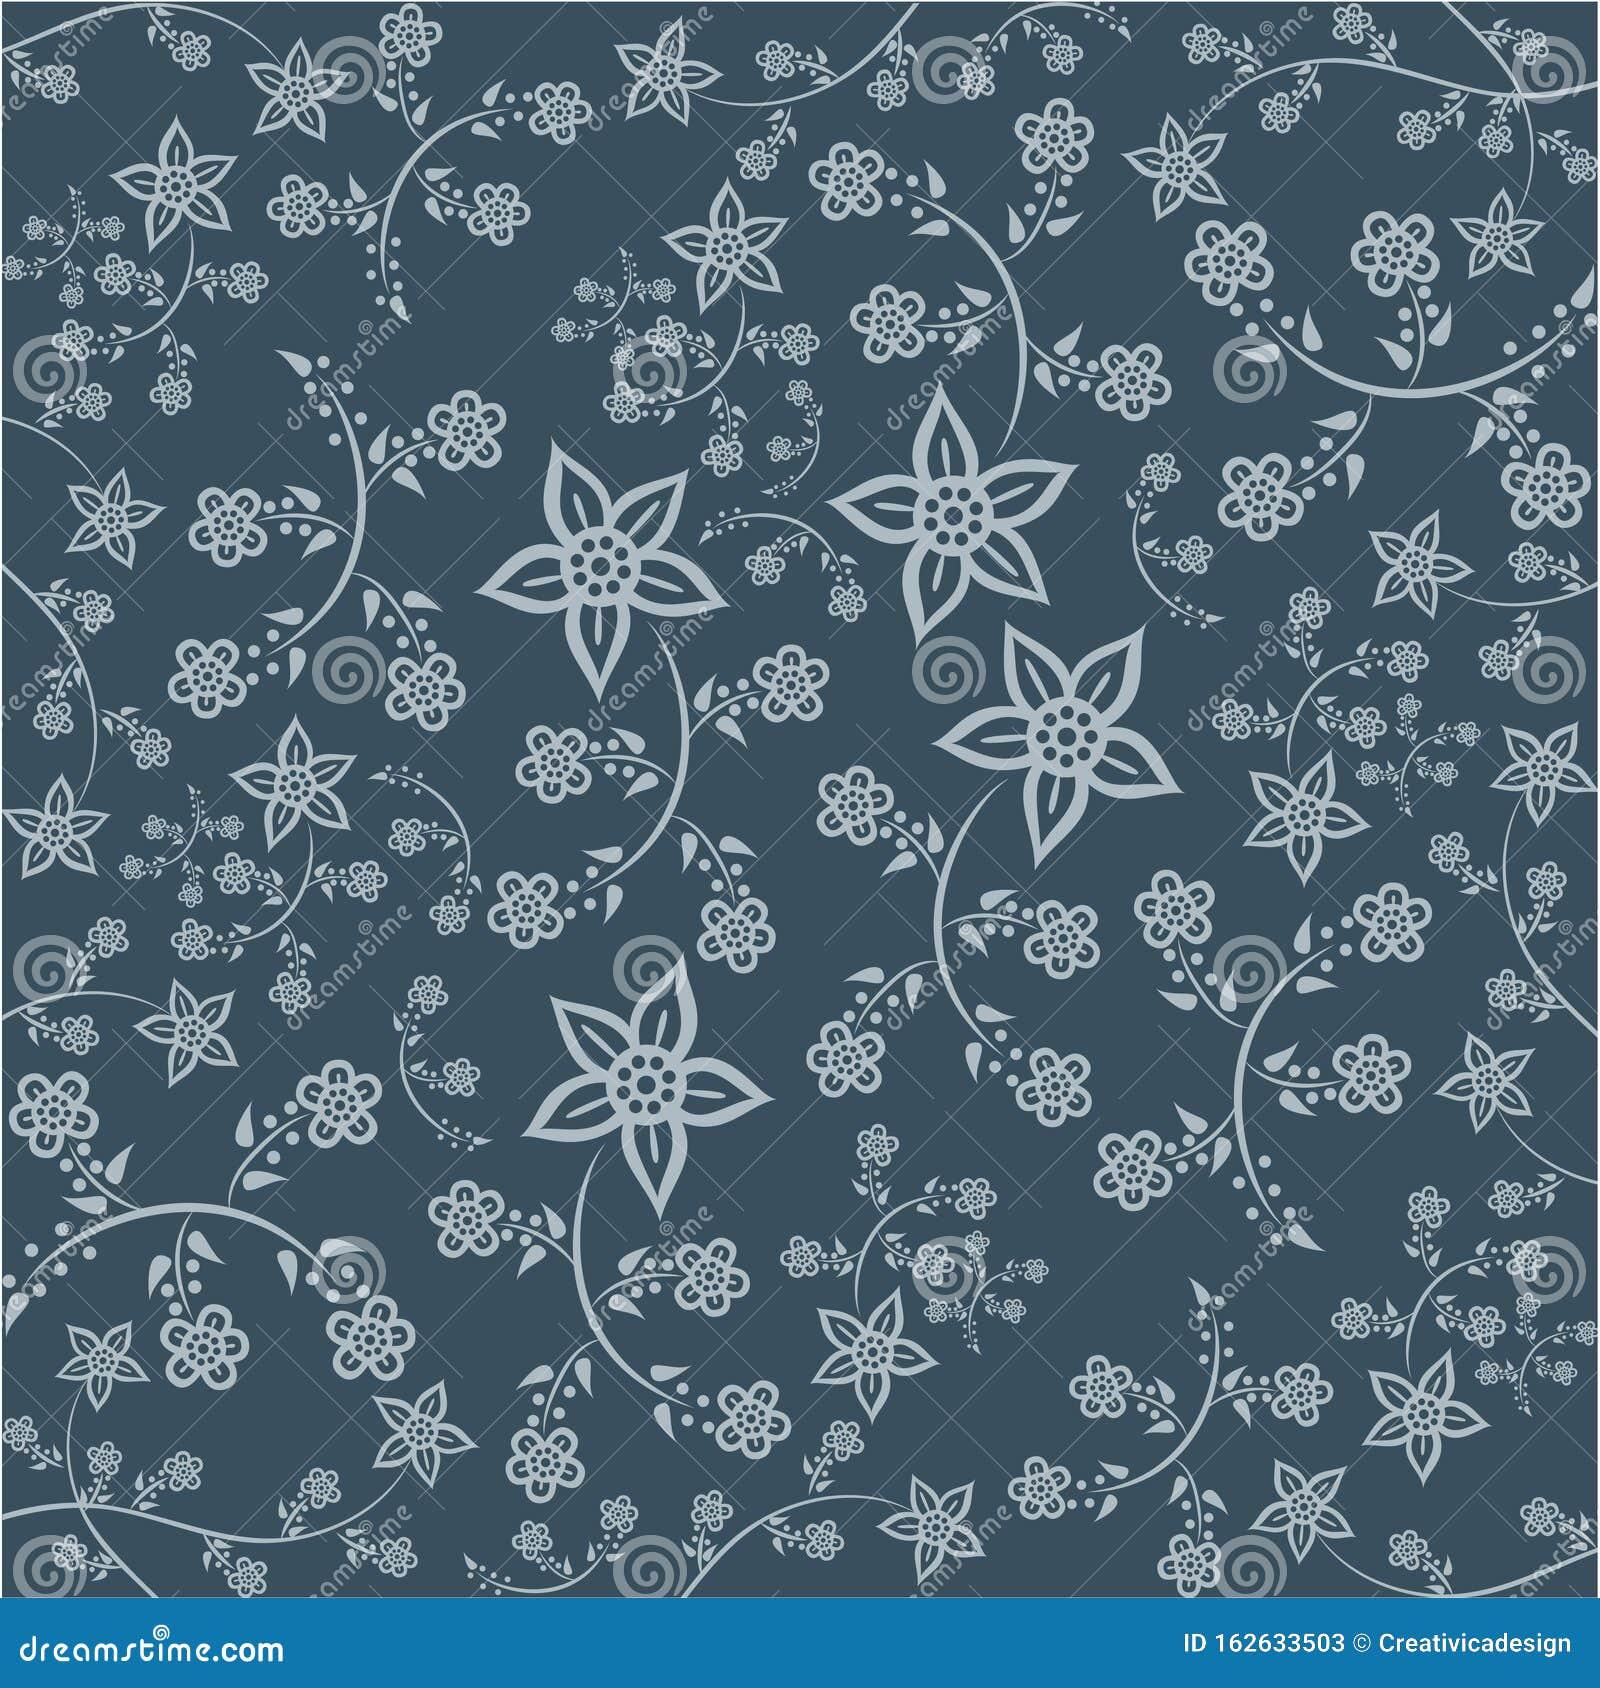 Floral Pattern. Javanese Batik Style Version 2 Bright